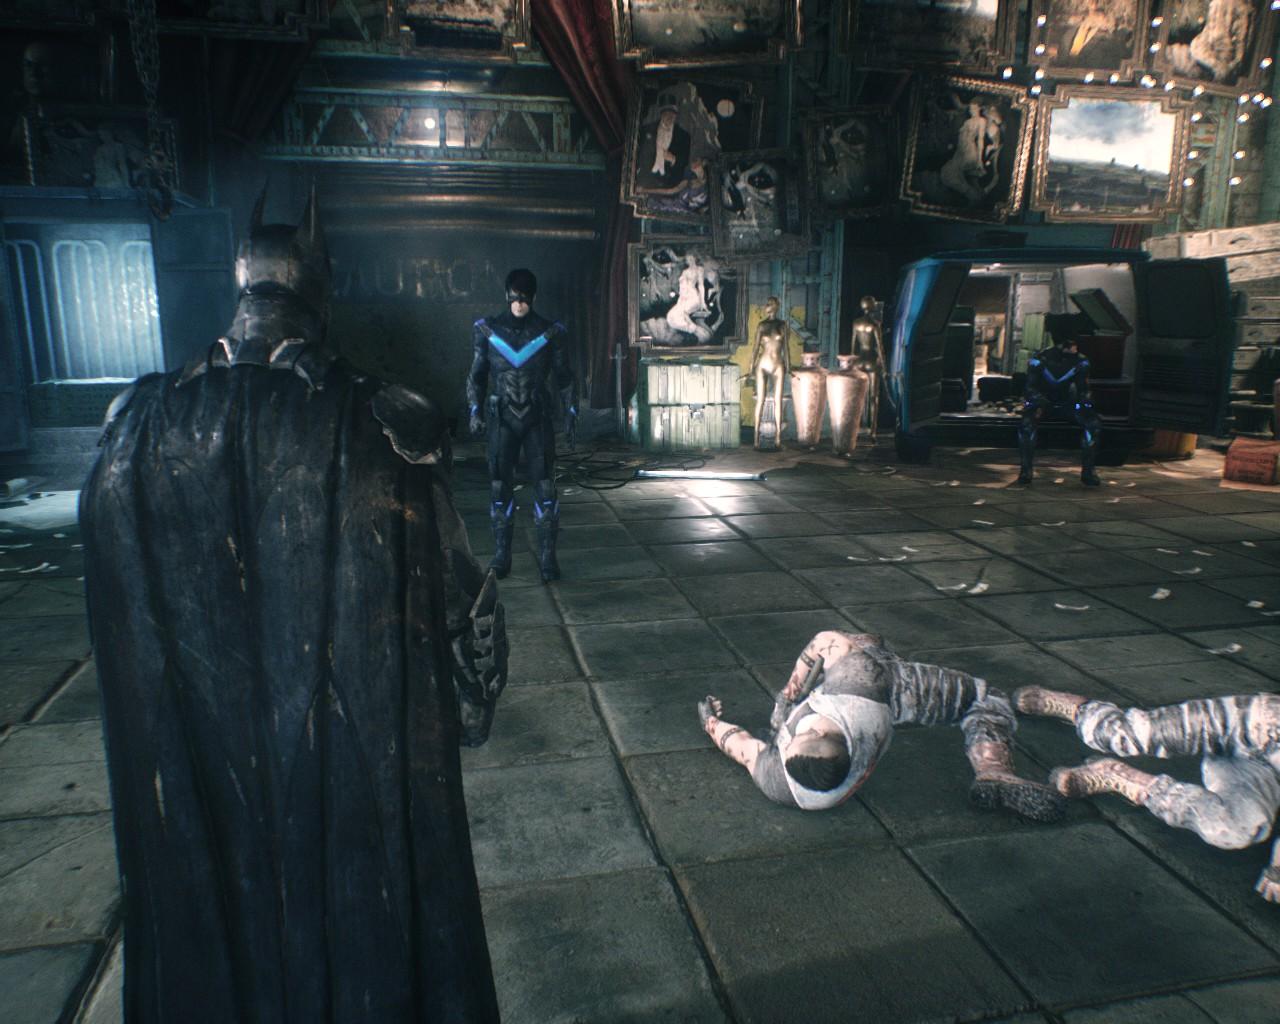 20190717225905_1.jpg - Batman: Arkham Knight